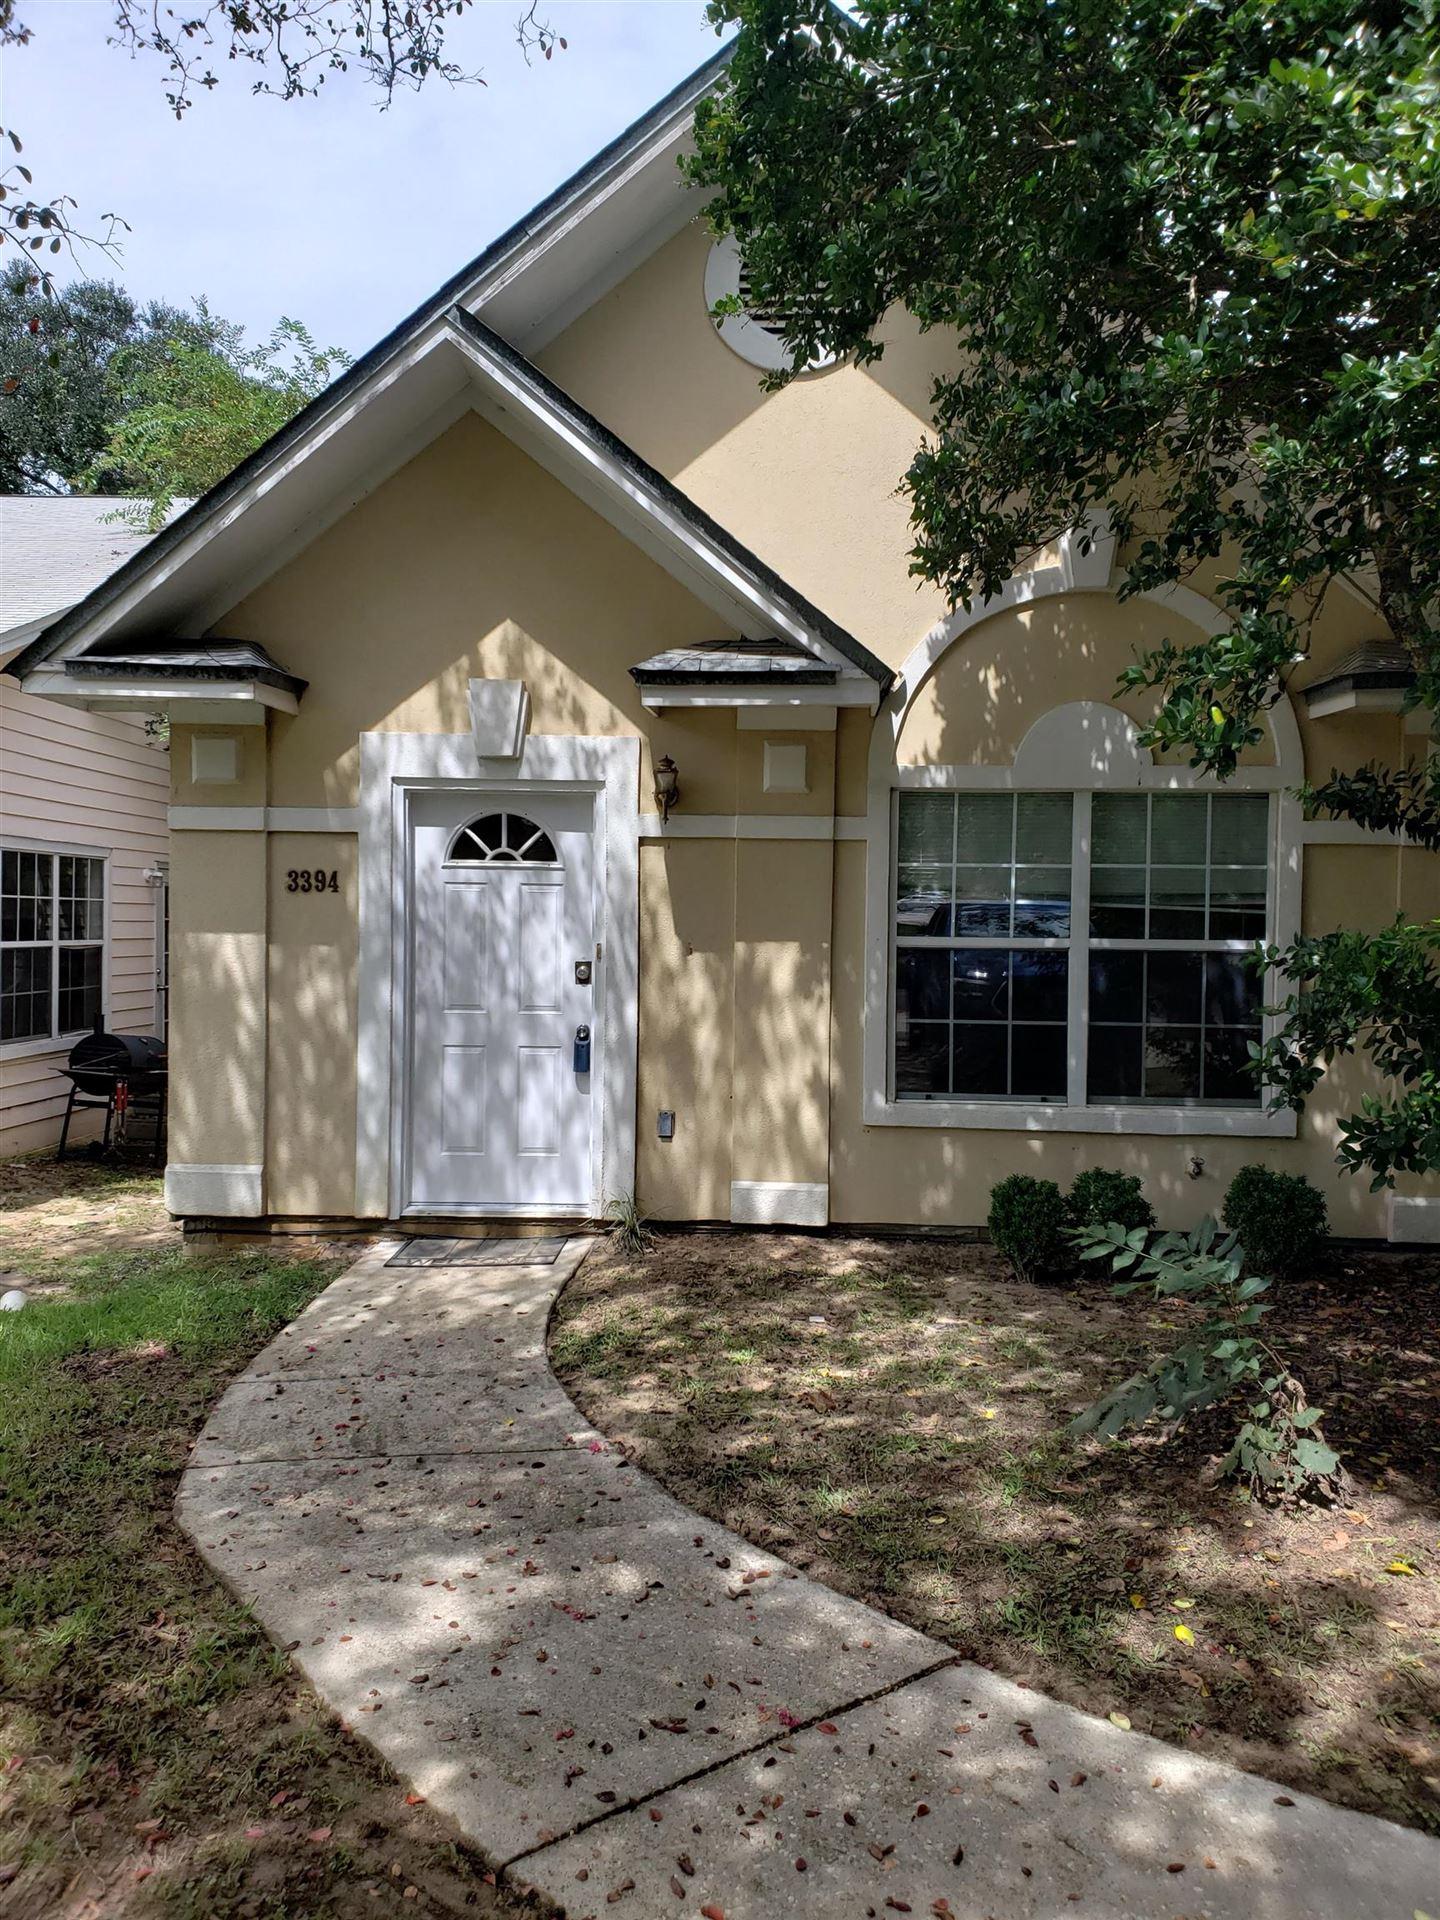 3394 Tansey Court, Tallahassee, FL 32308 - MLS#: 337527